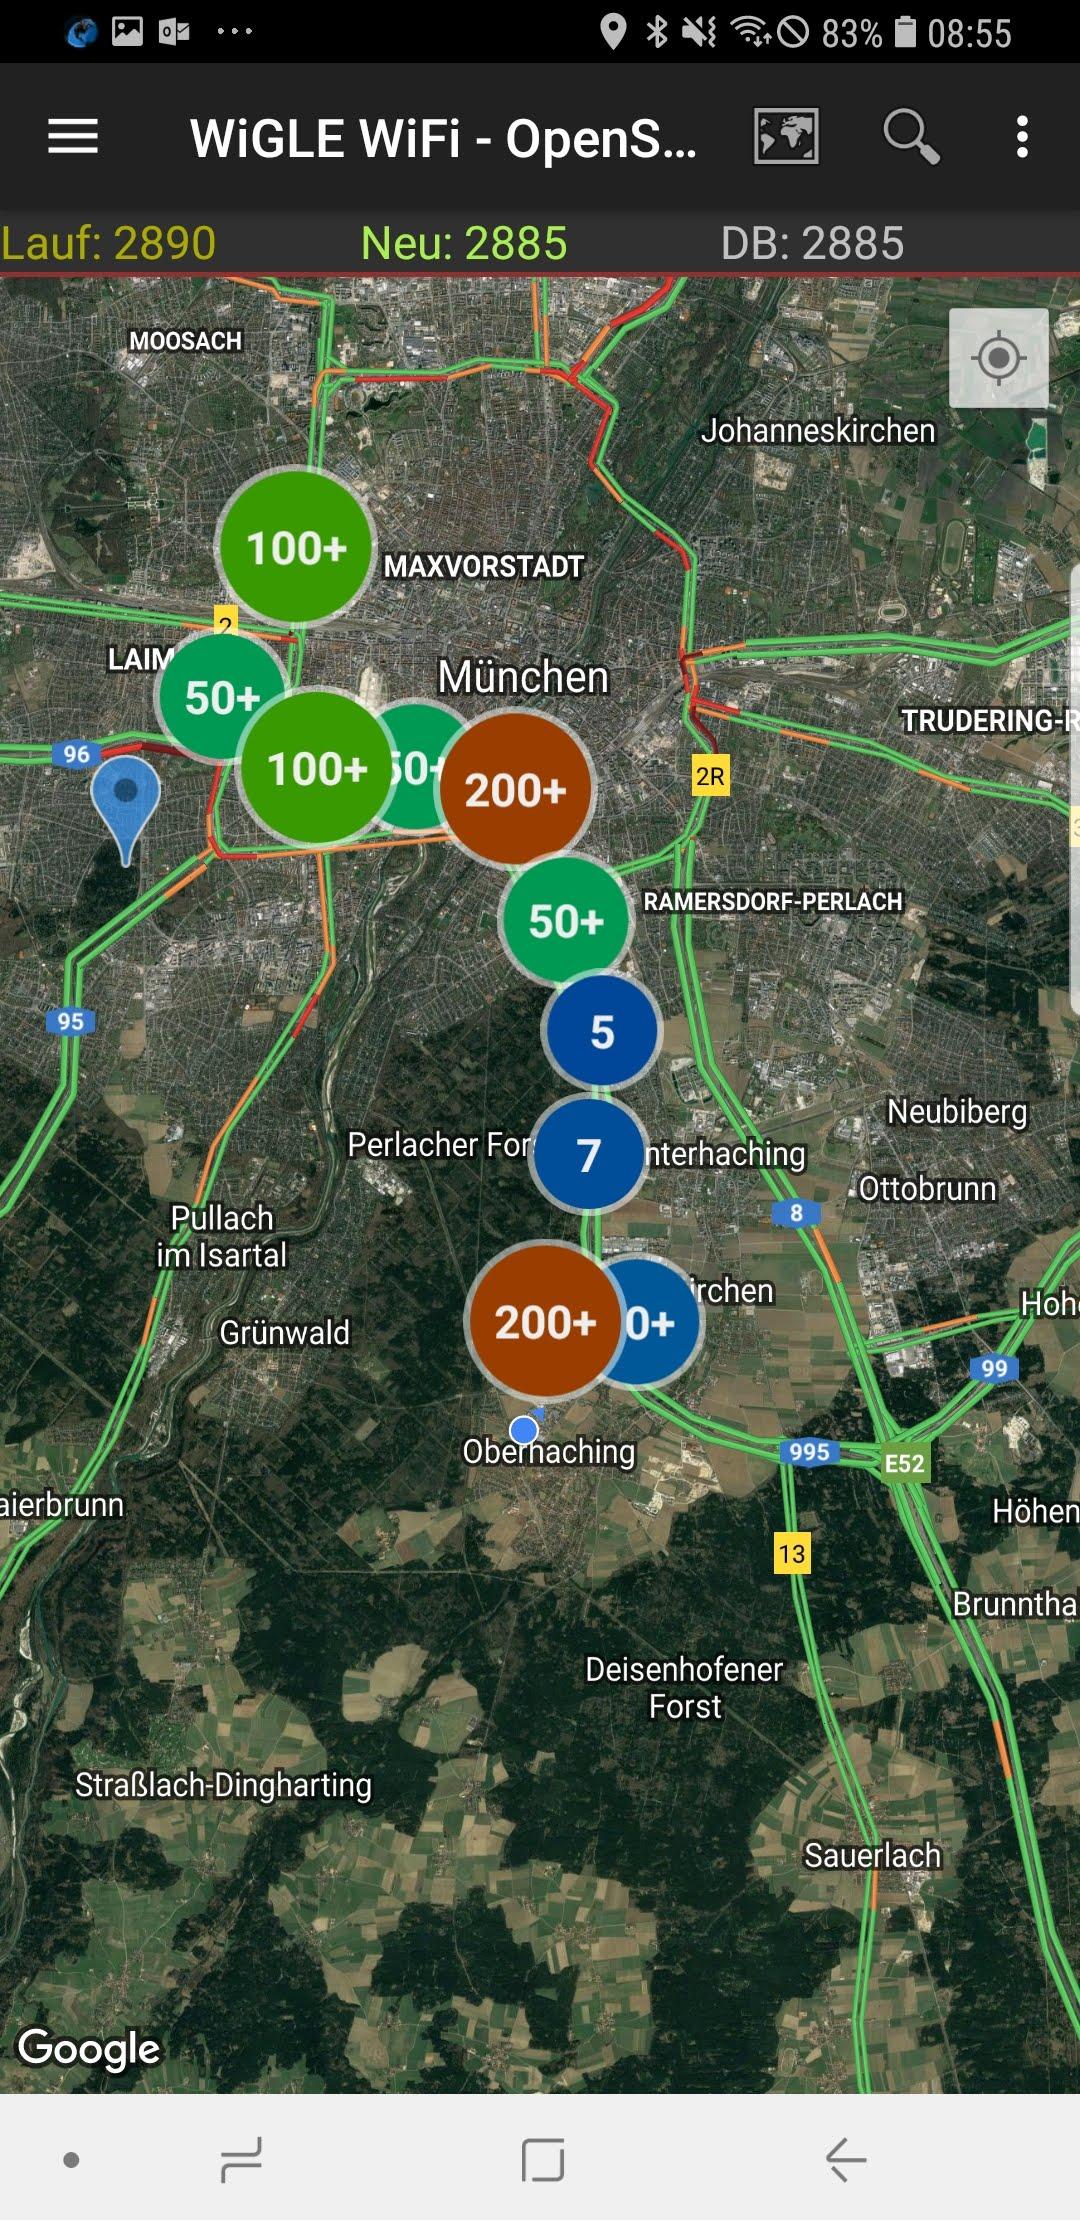 Dahoam nach Oberhaching